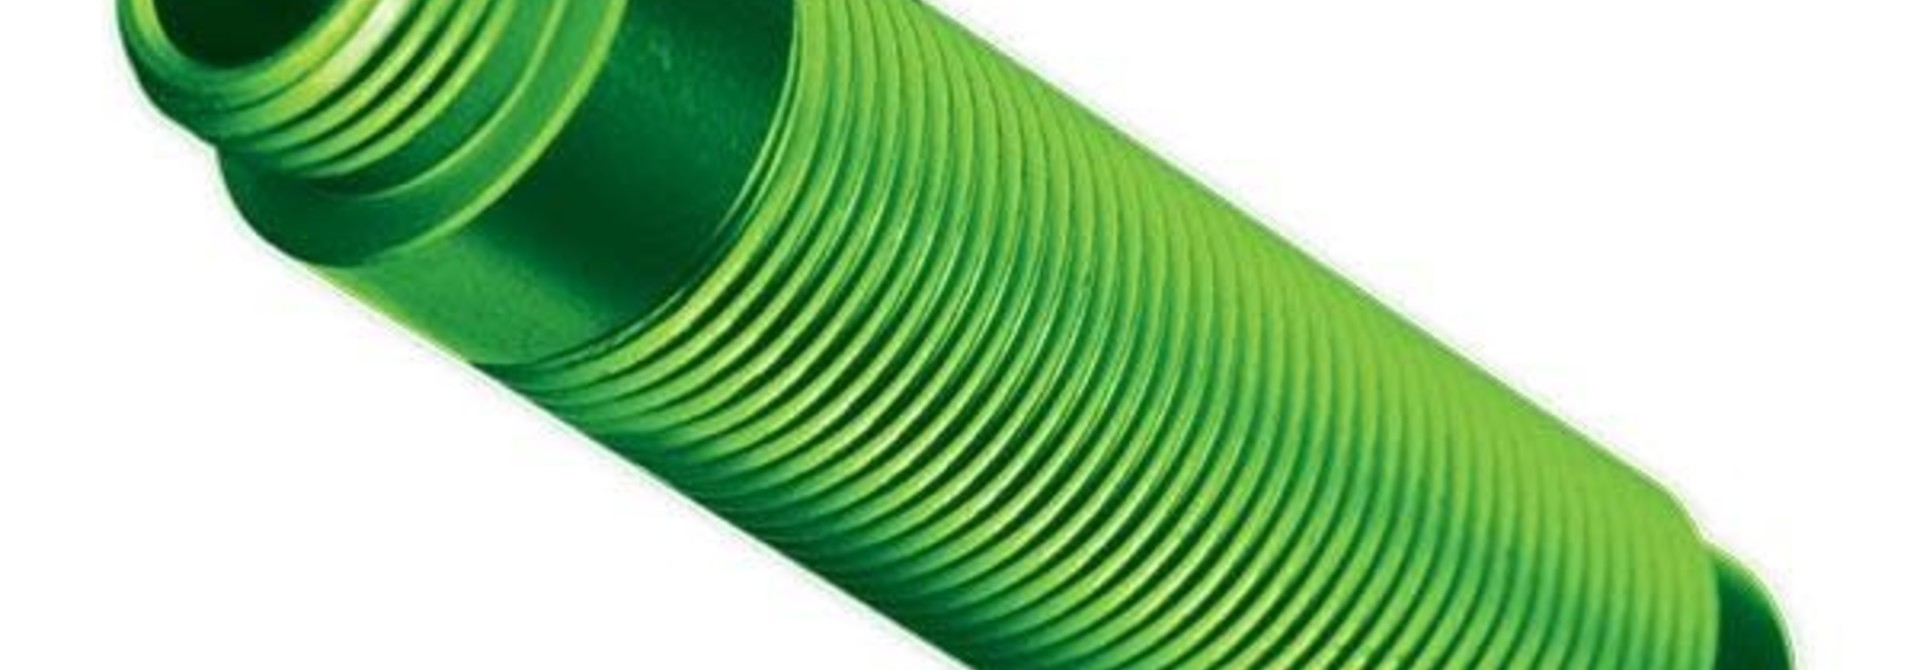 Body, GTS shock, aluminum (Green-anodized) (1), #TRX8266G